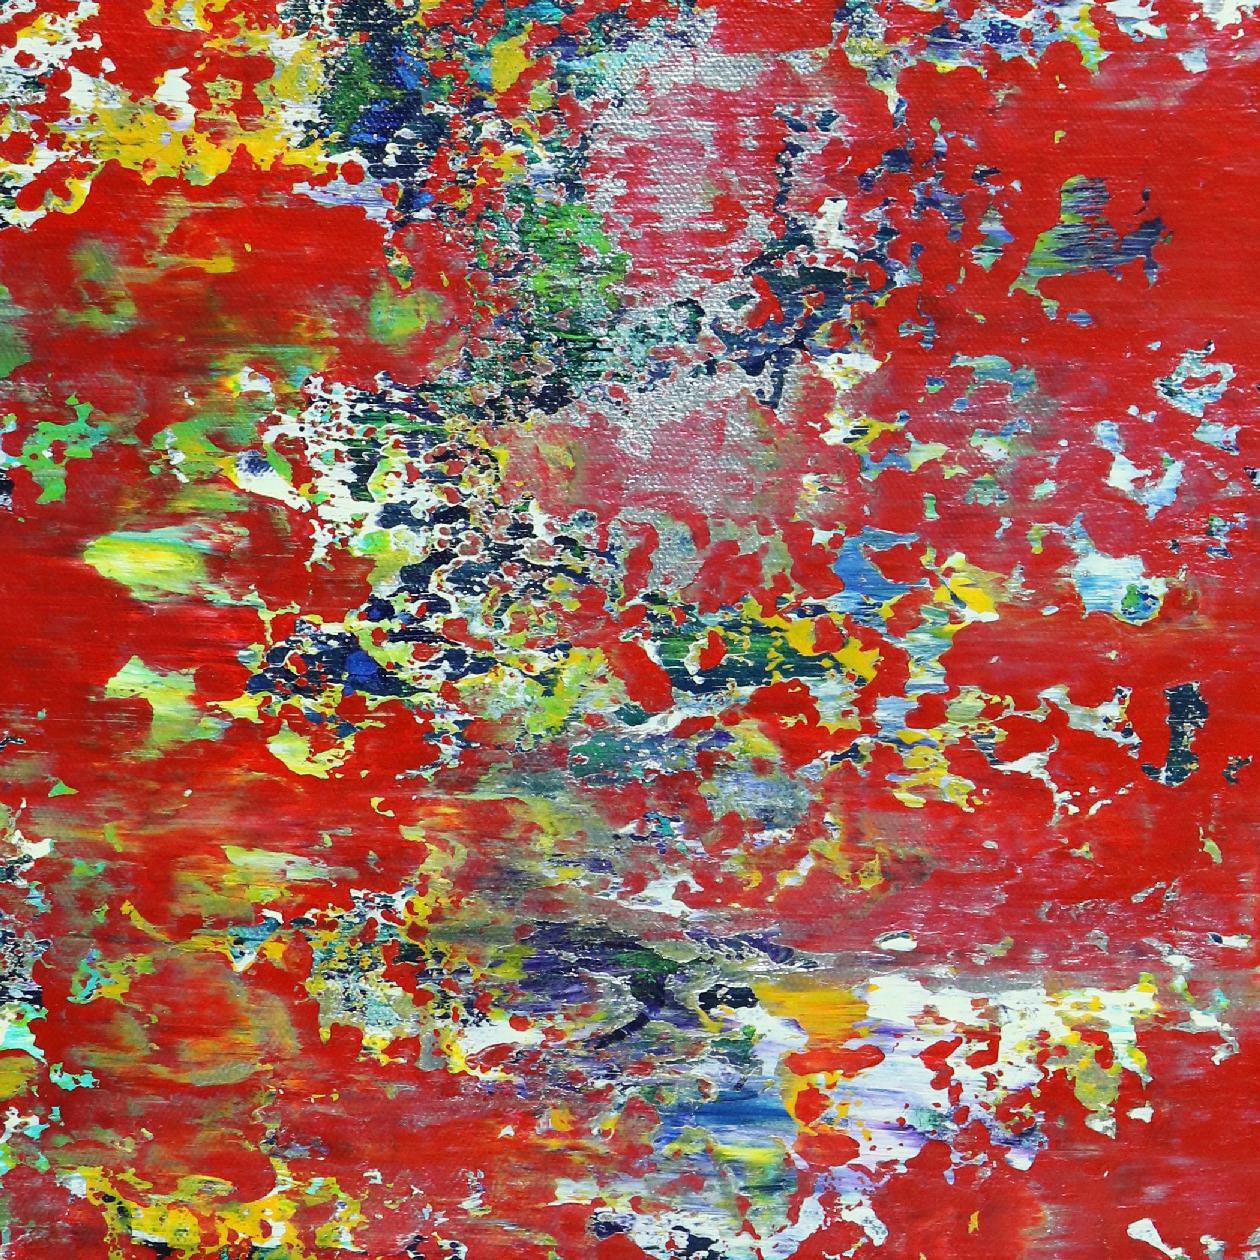 Detail - Fire Rhythms (Earth Formations) #2 (2020) by Nestor Toro